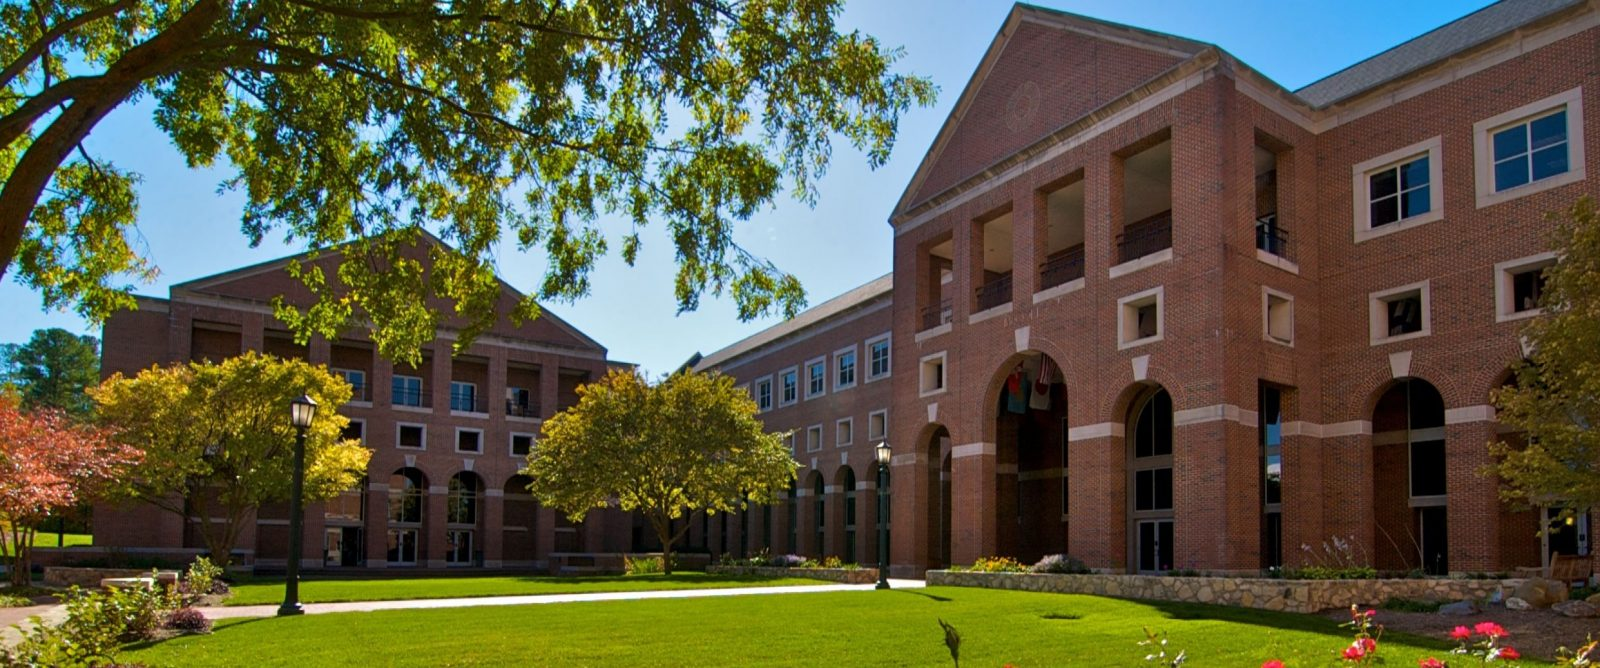 Kenan-Flagler Business School